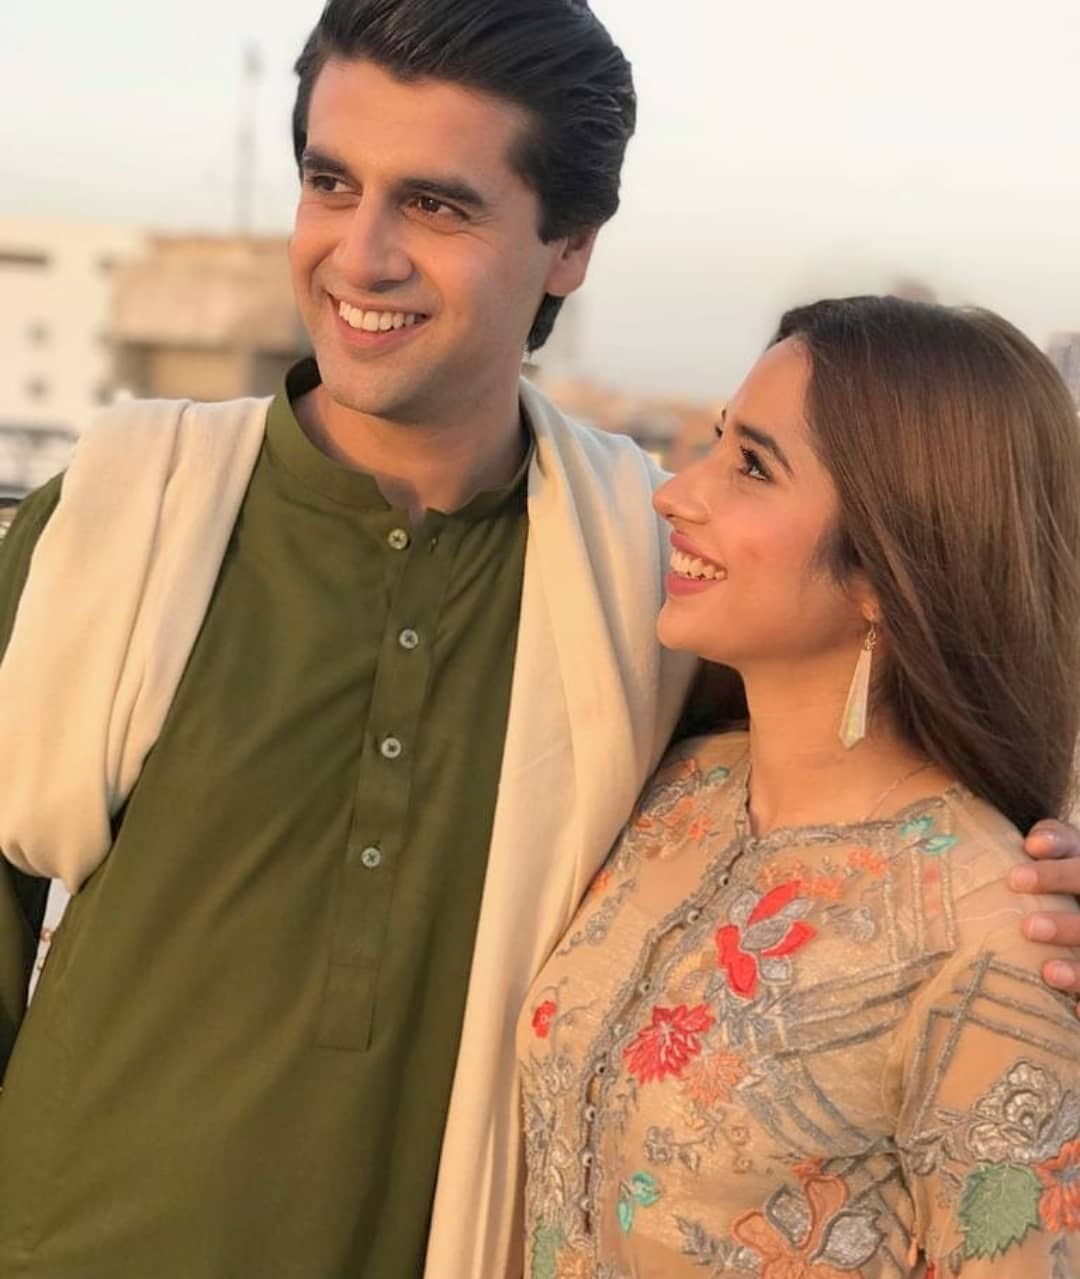 Actors Iqra Aziz and Farhan Saeed on the Set of Drama Suno Chanda 2